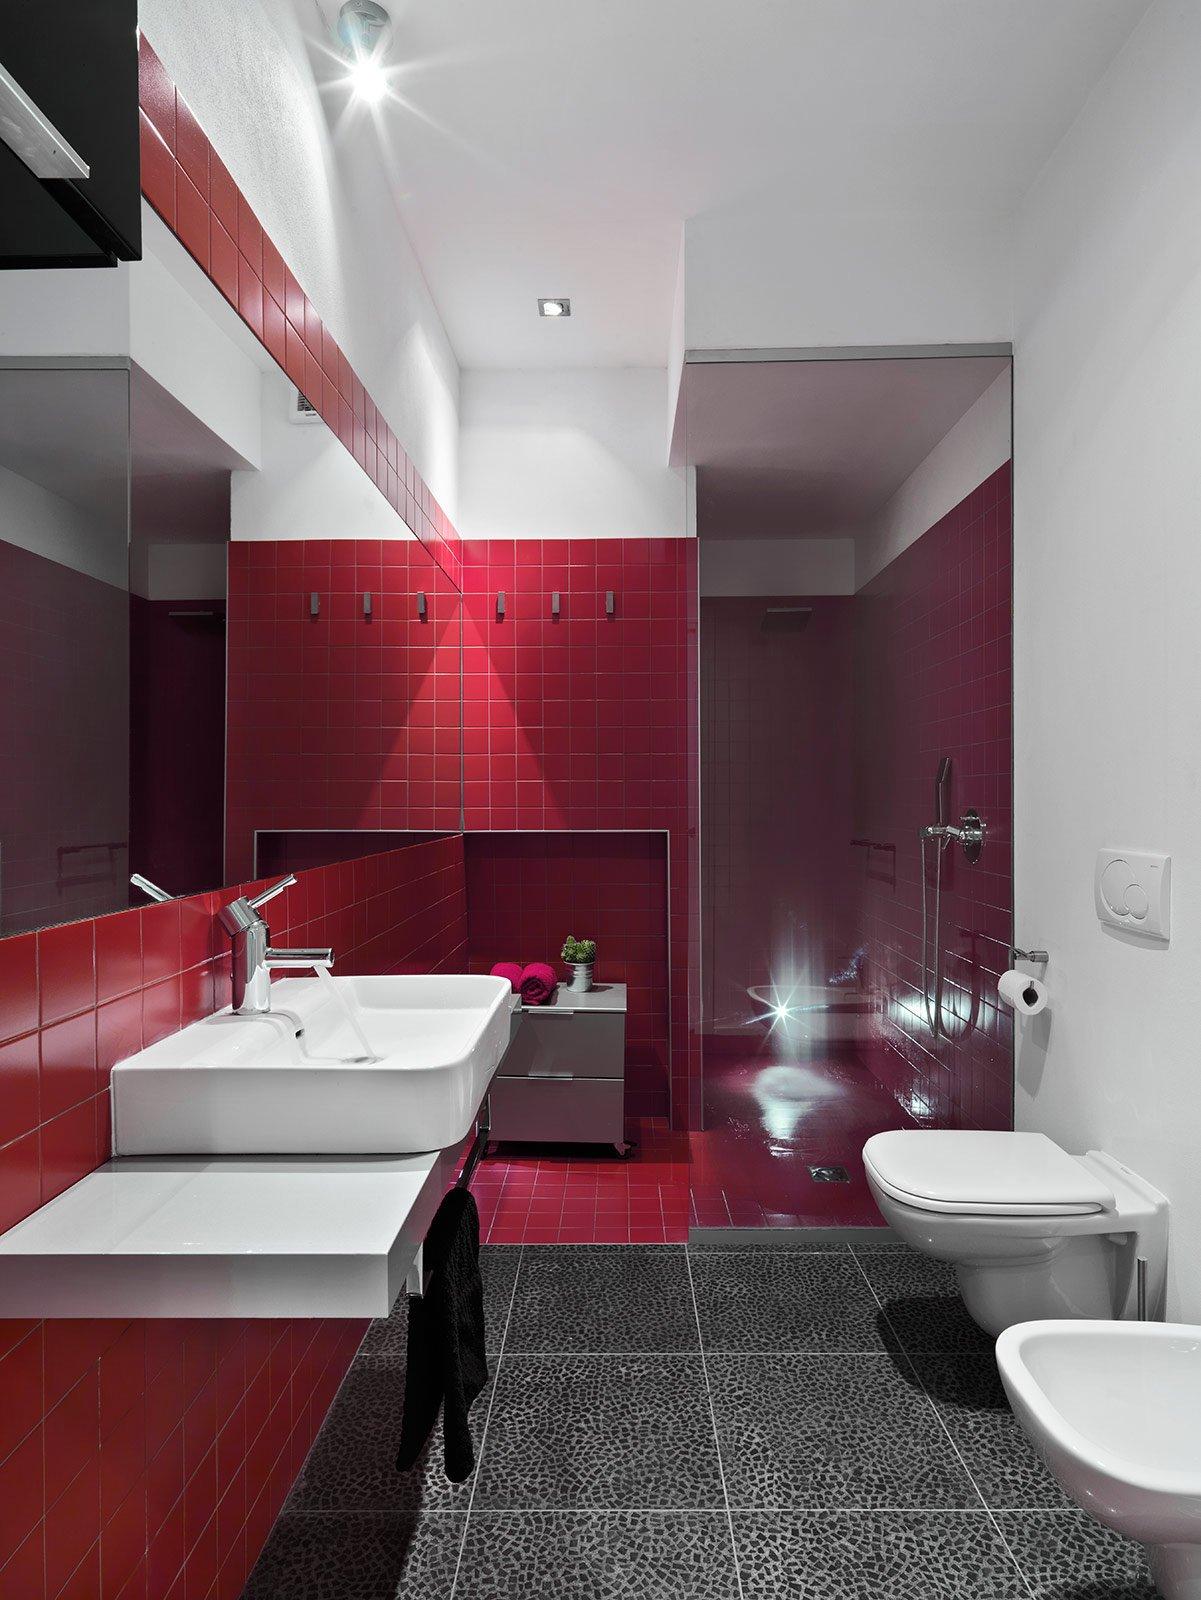 Applique moderna elegante for Case moderne interni piccole